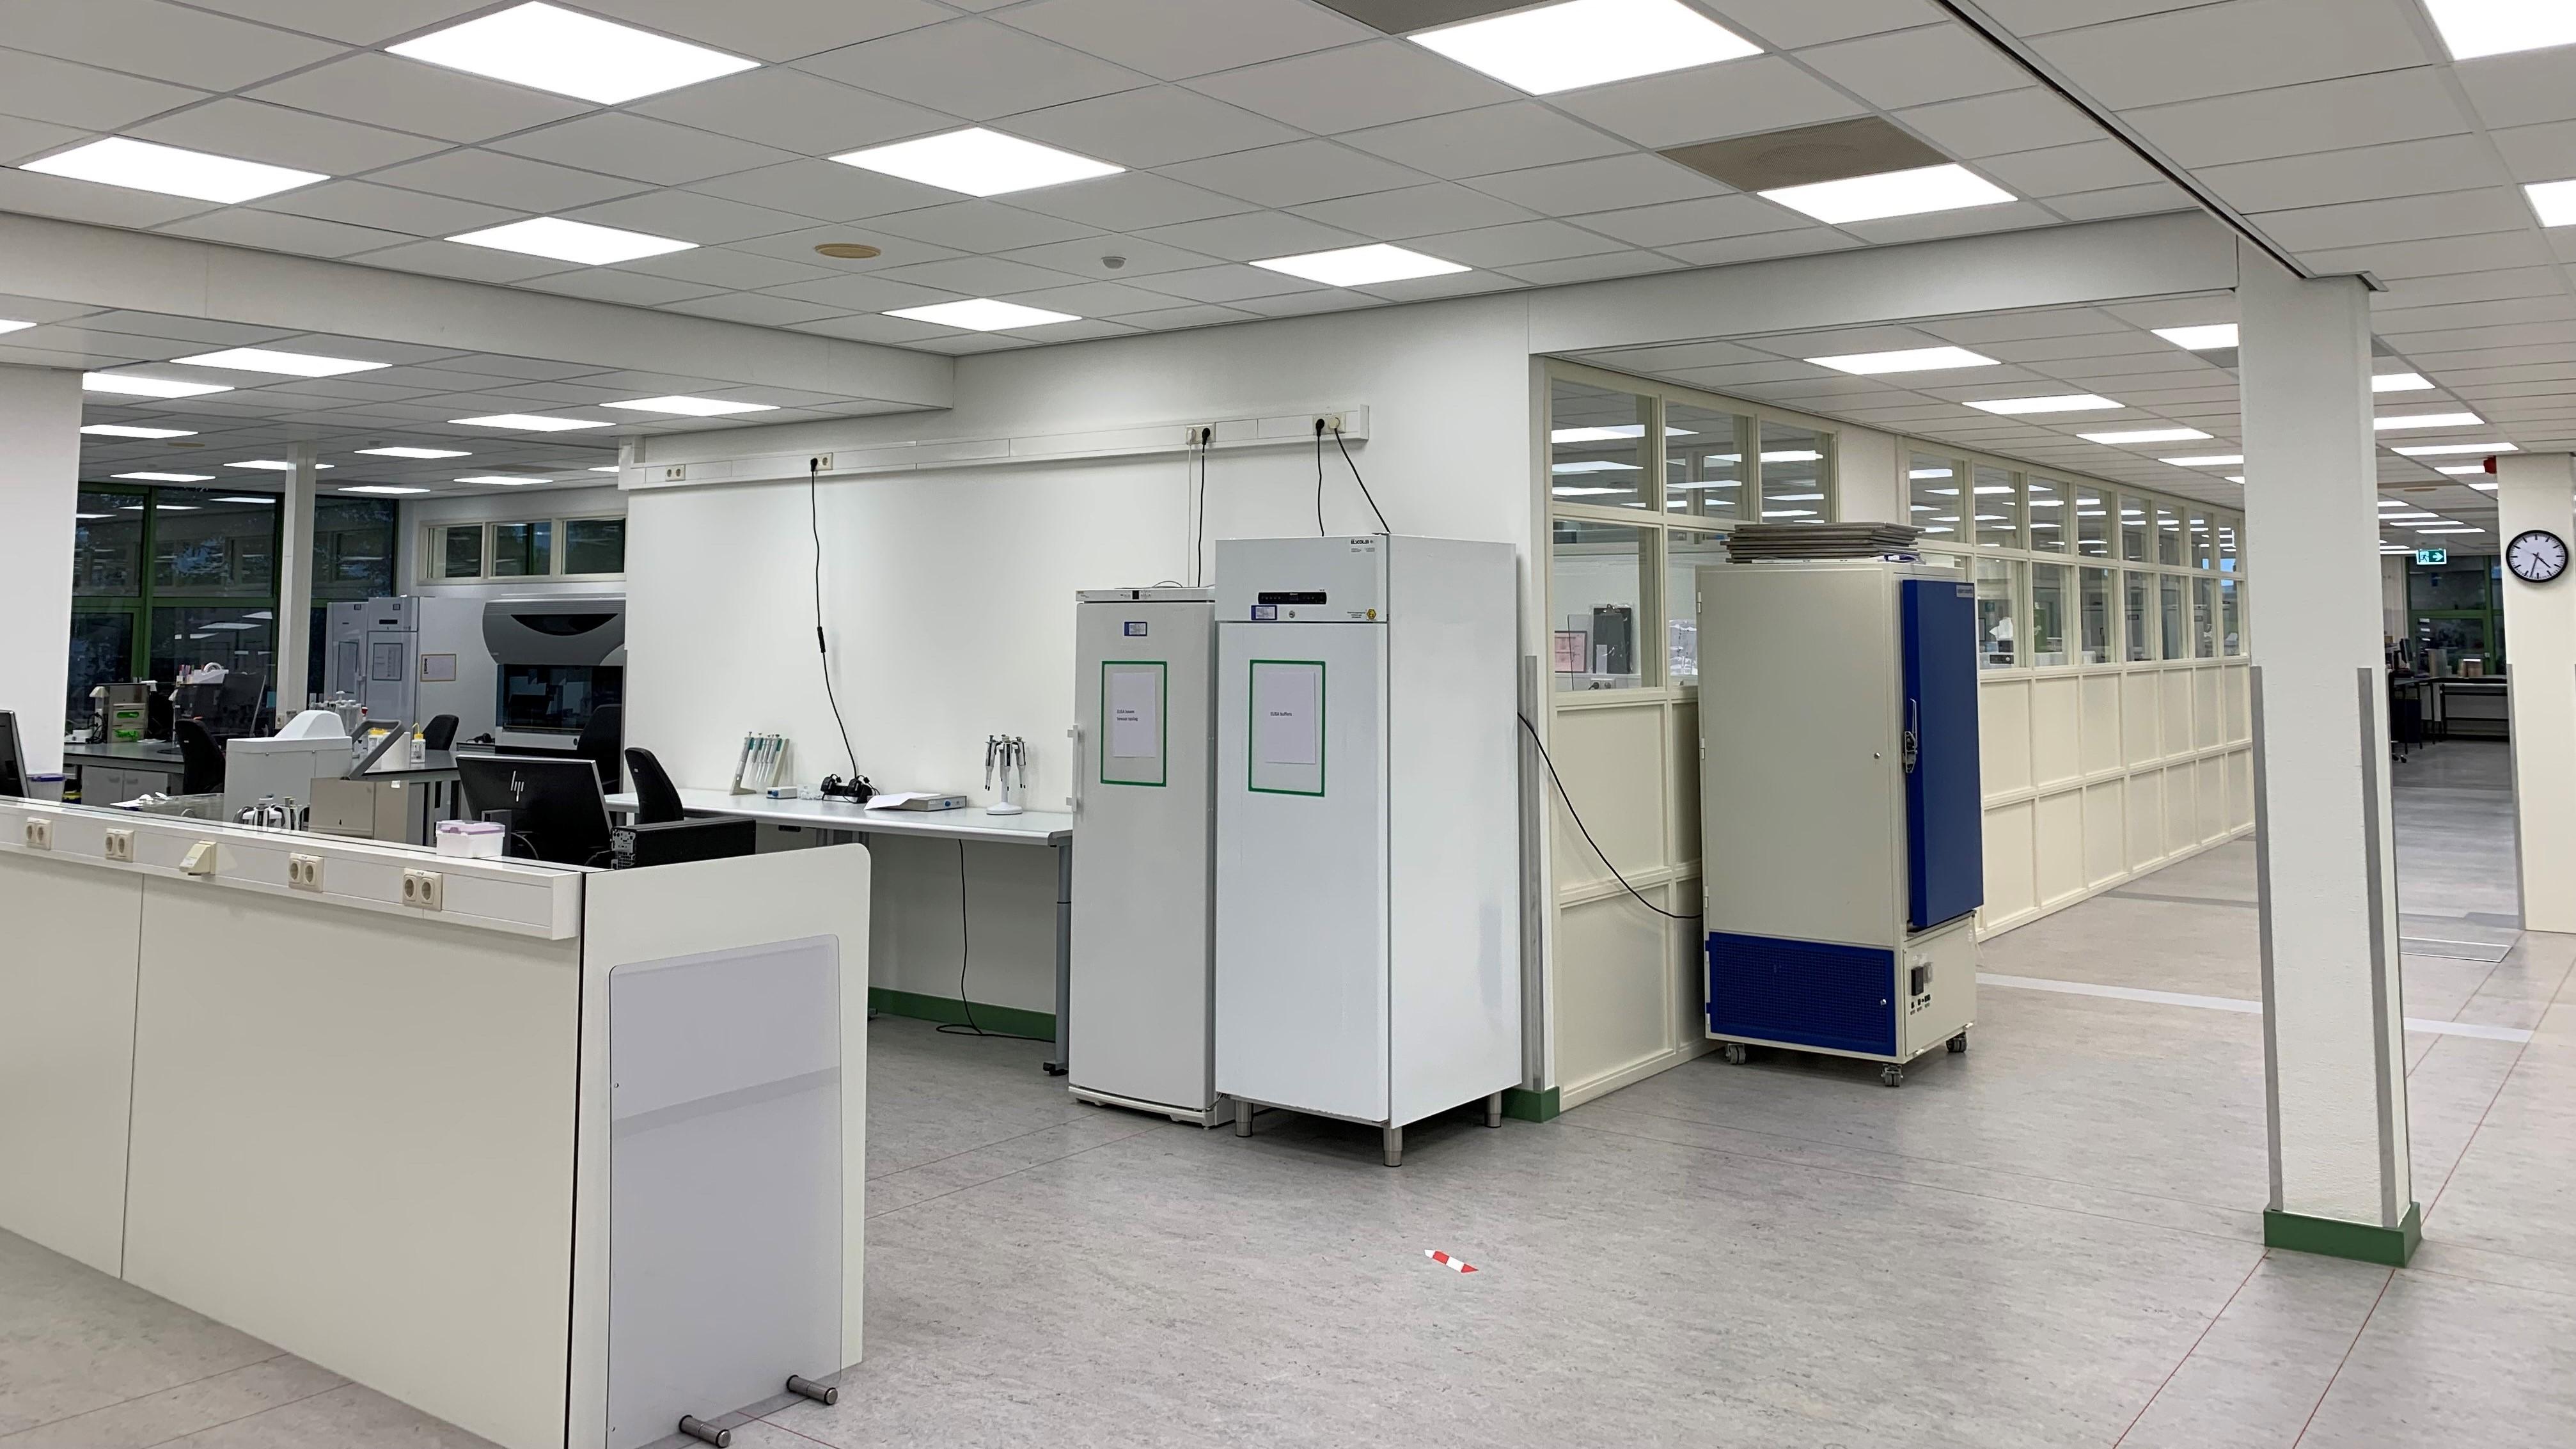 Verbouwing laboratoria afgerond